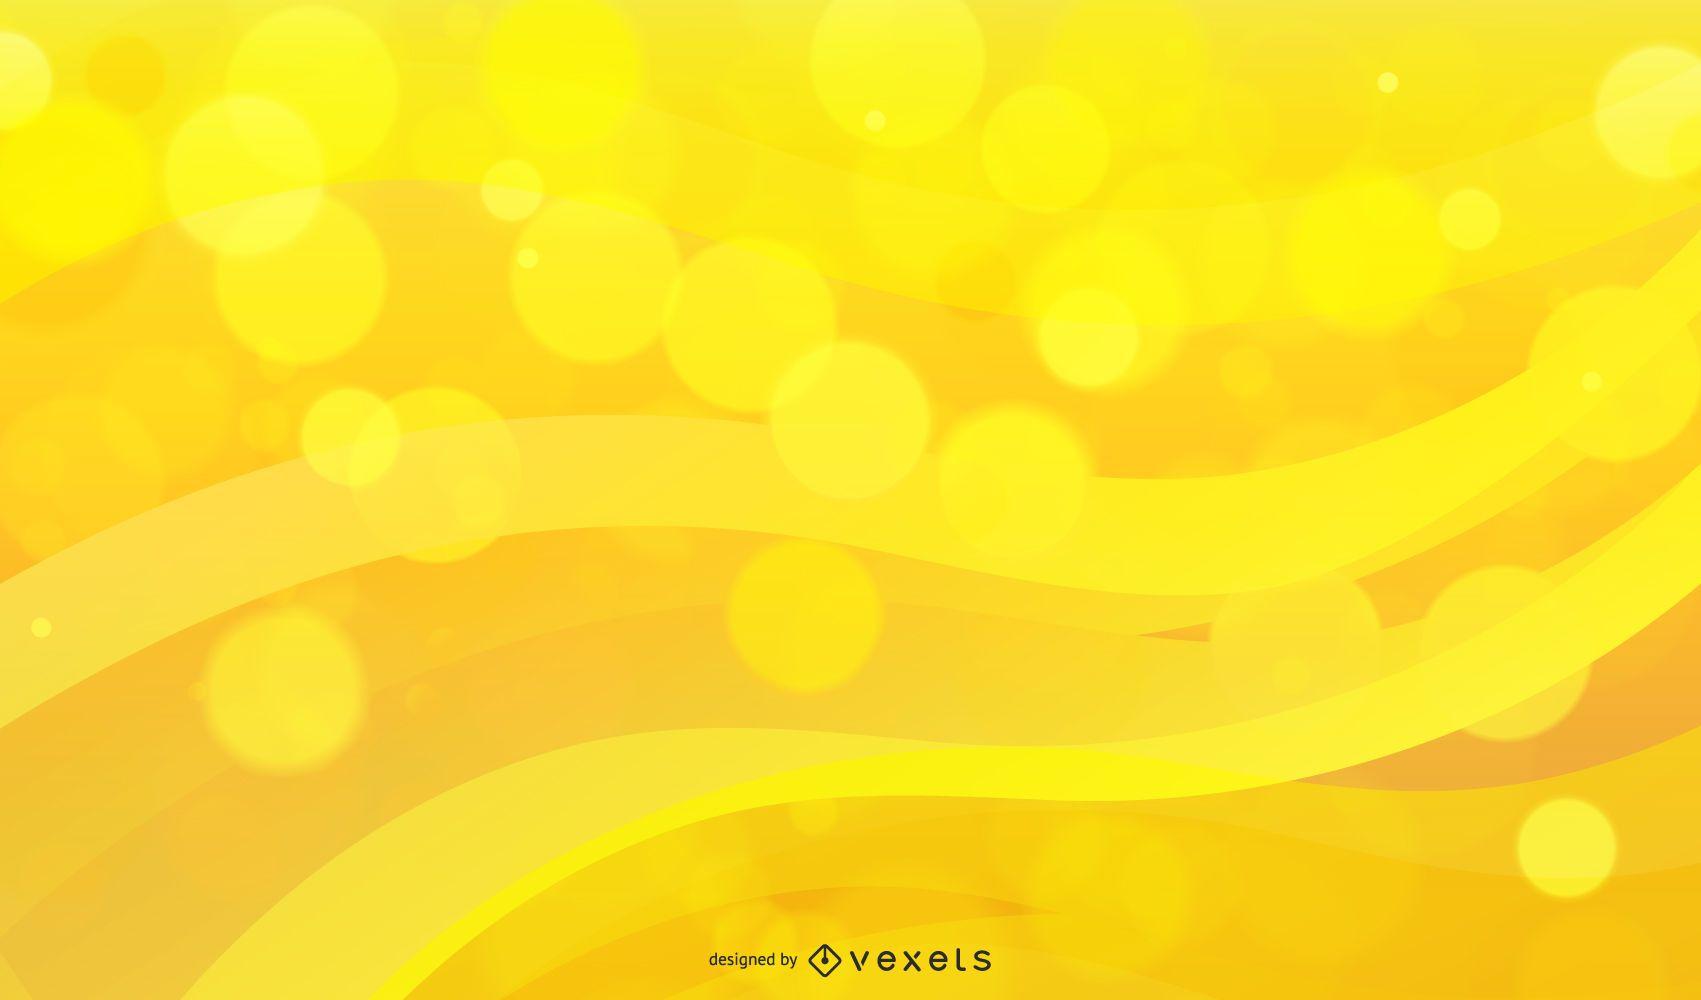 Fondo amarillo brillante onda Bokeh